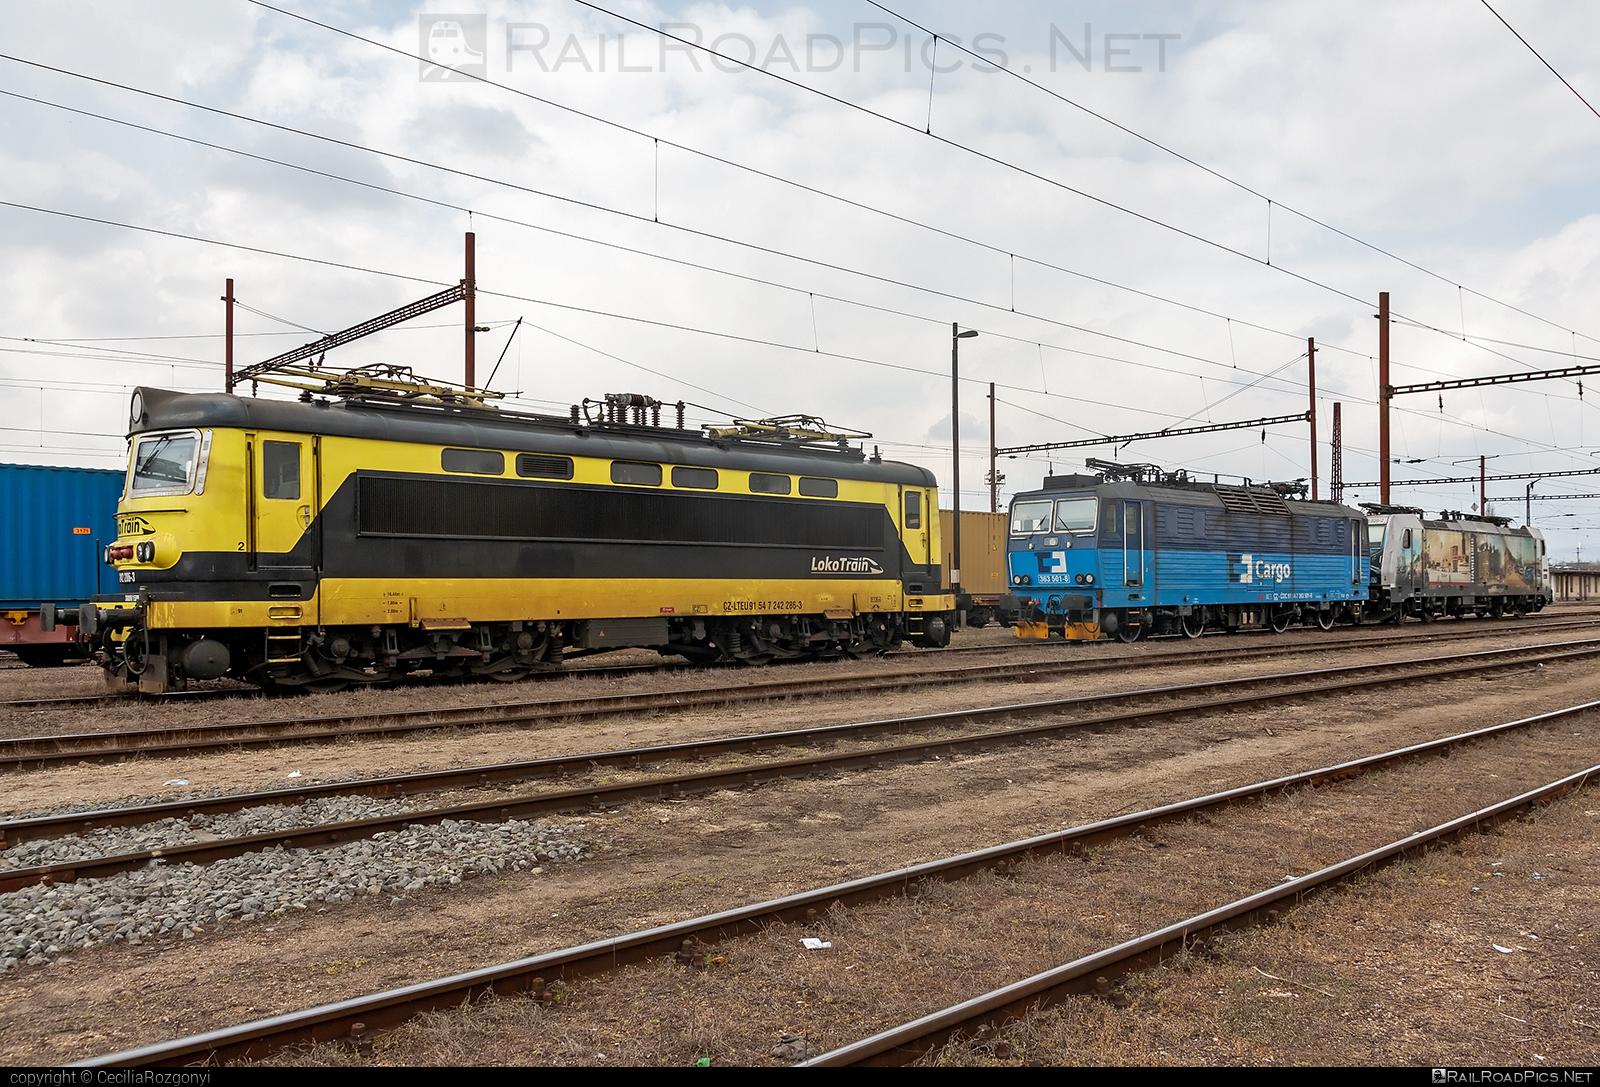 Škoda 73E - 242 286-3 operated by Loko Train s.r.o. #locomotive242 #lokotrain #lokotrainsro #plechac #skoda #skoda73e